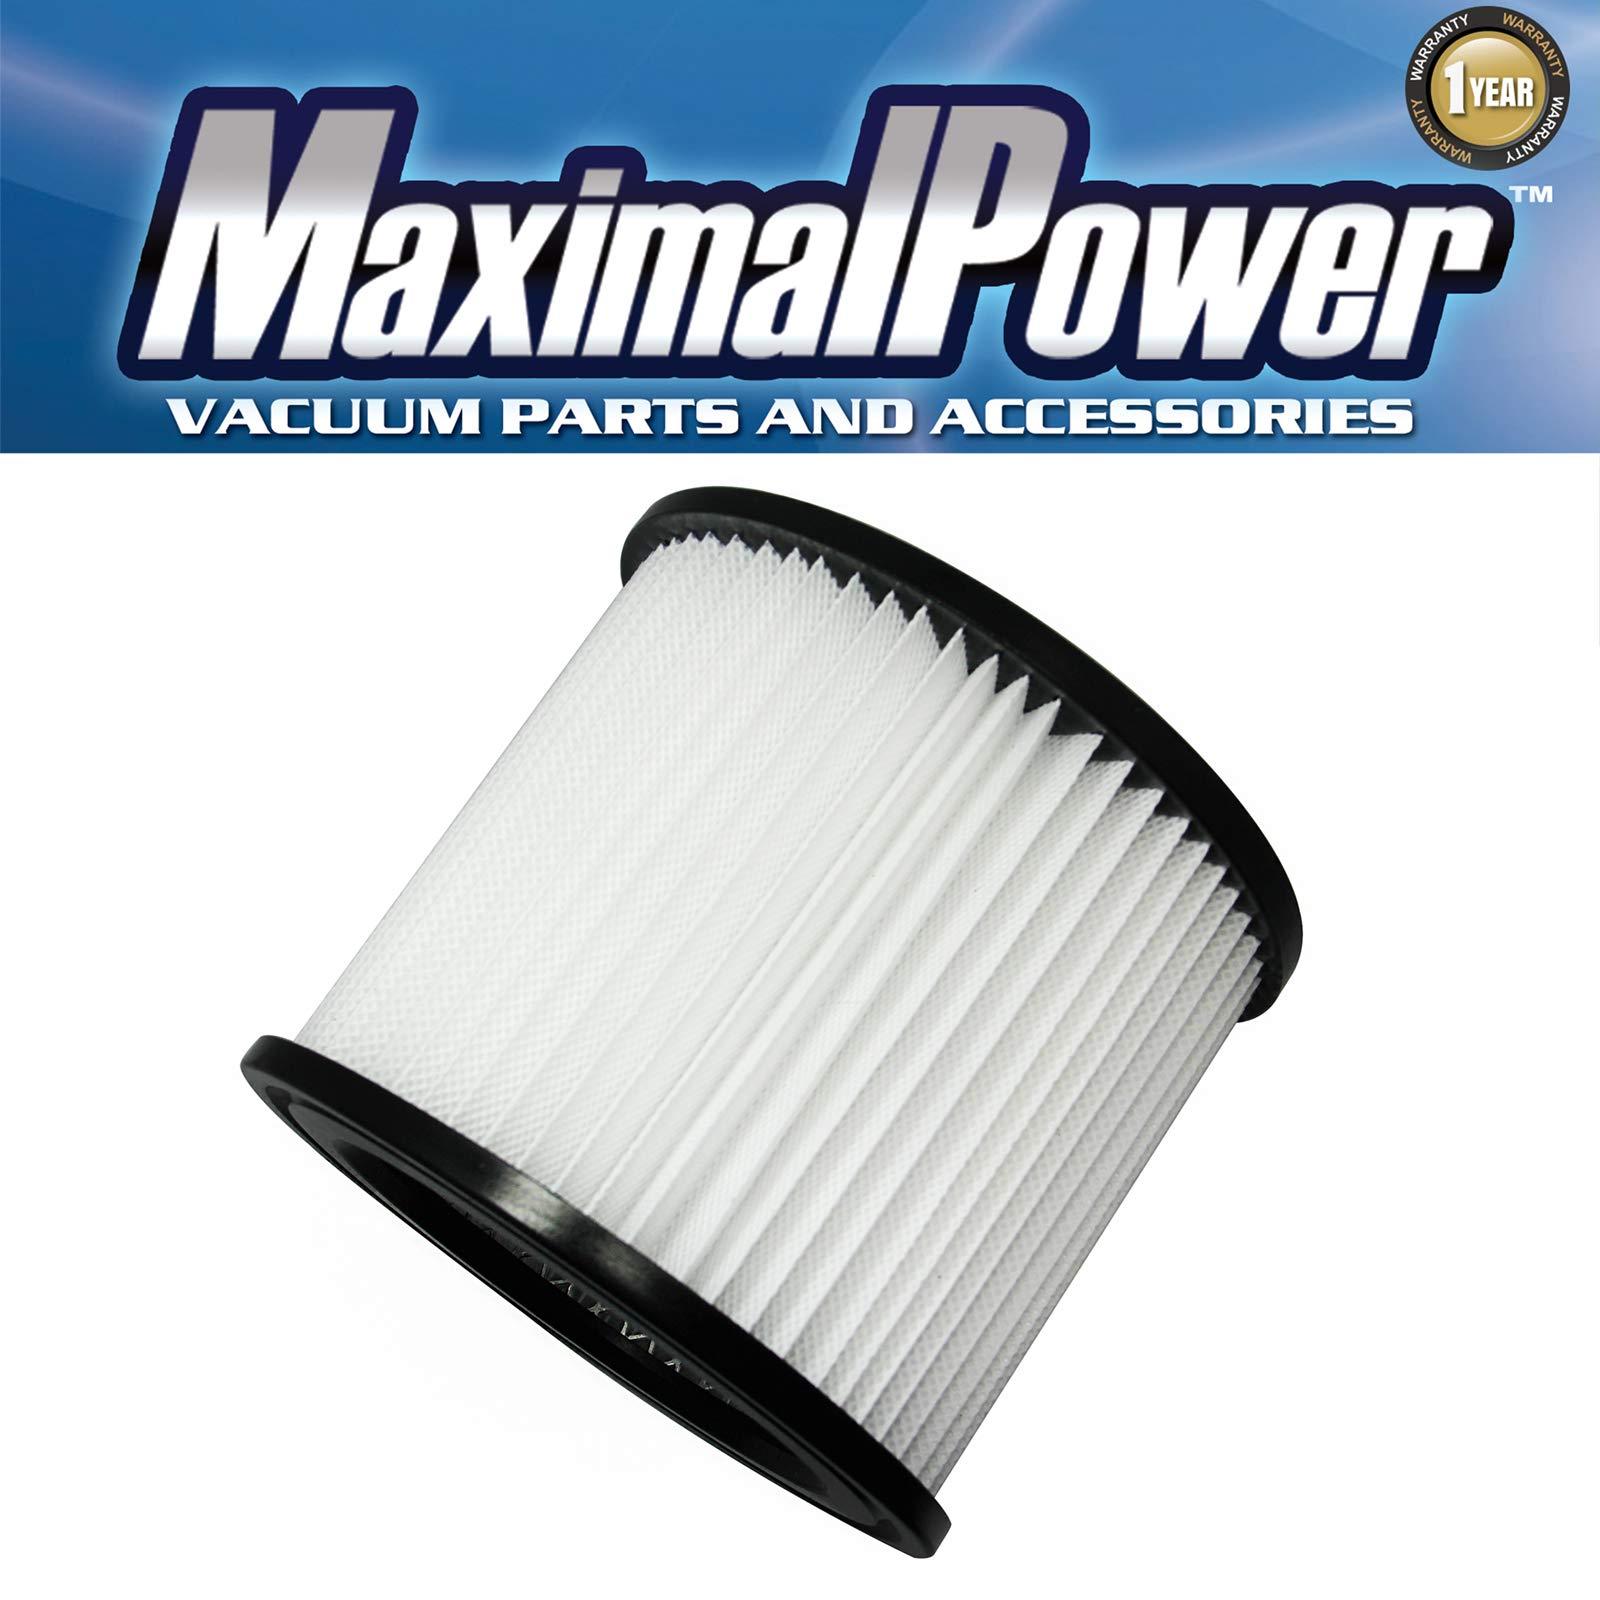 MaximalPower Replacement Filter for Shop Vac 903-98 Hangup Wet/Dry Vacuum Cartridge Filter